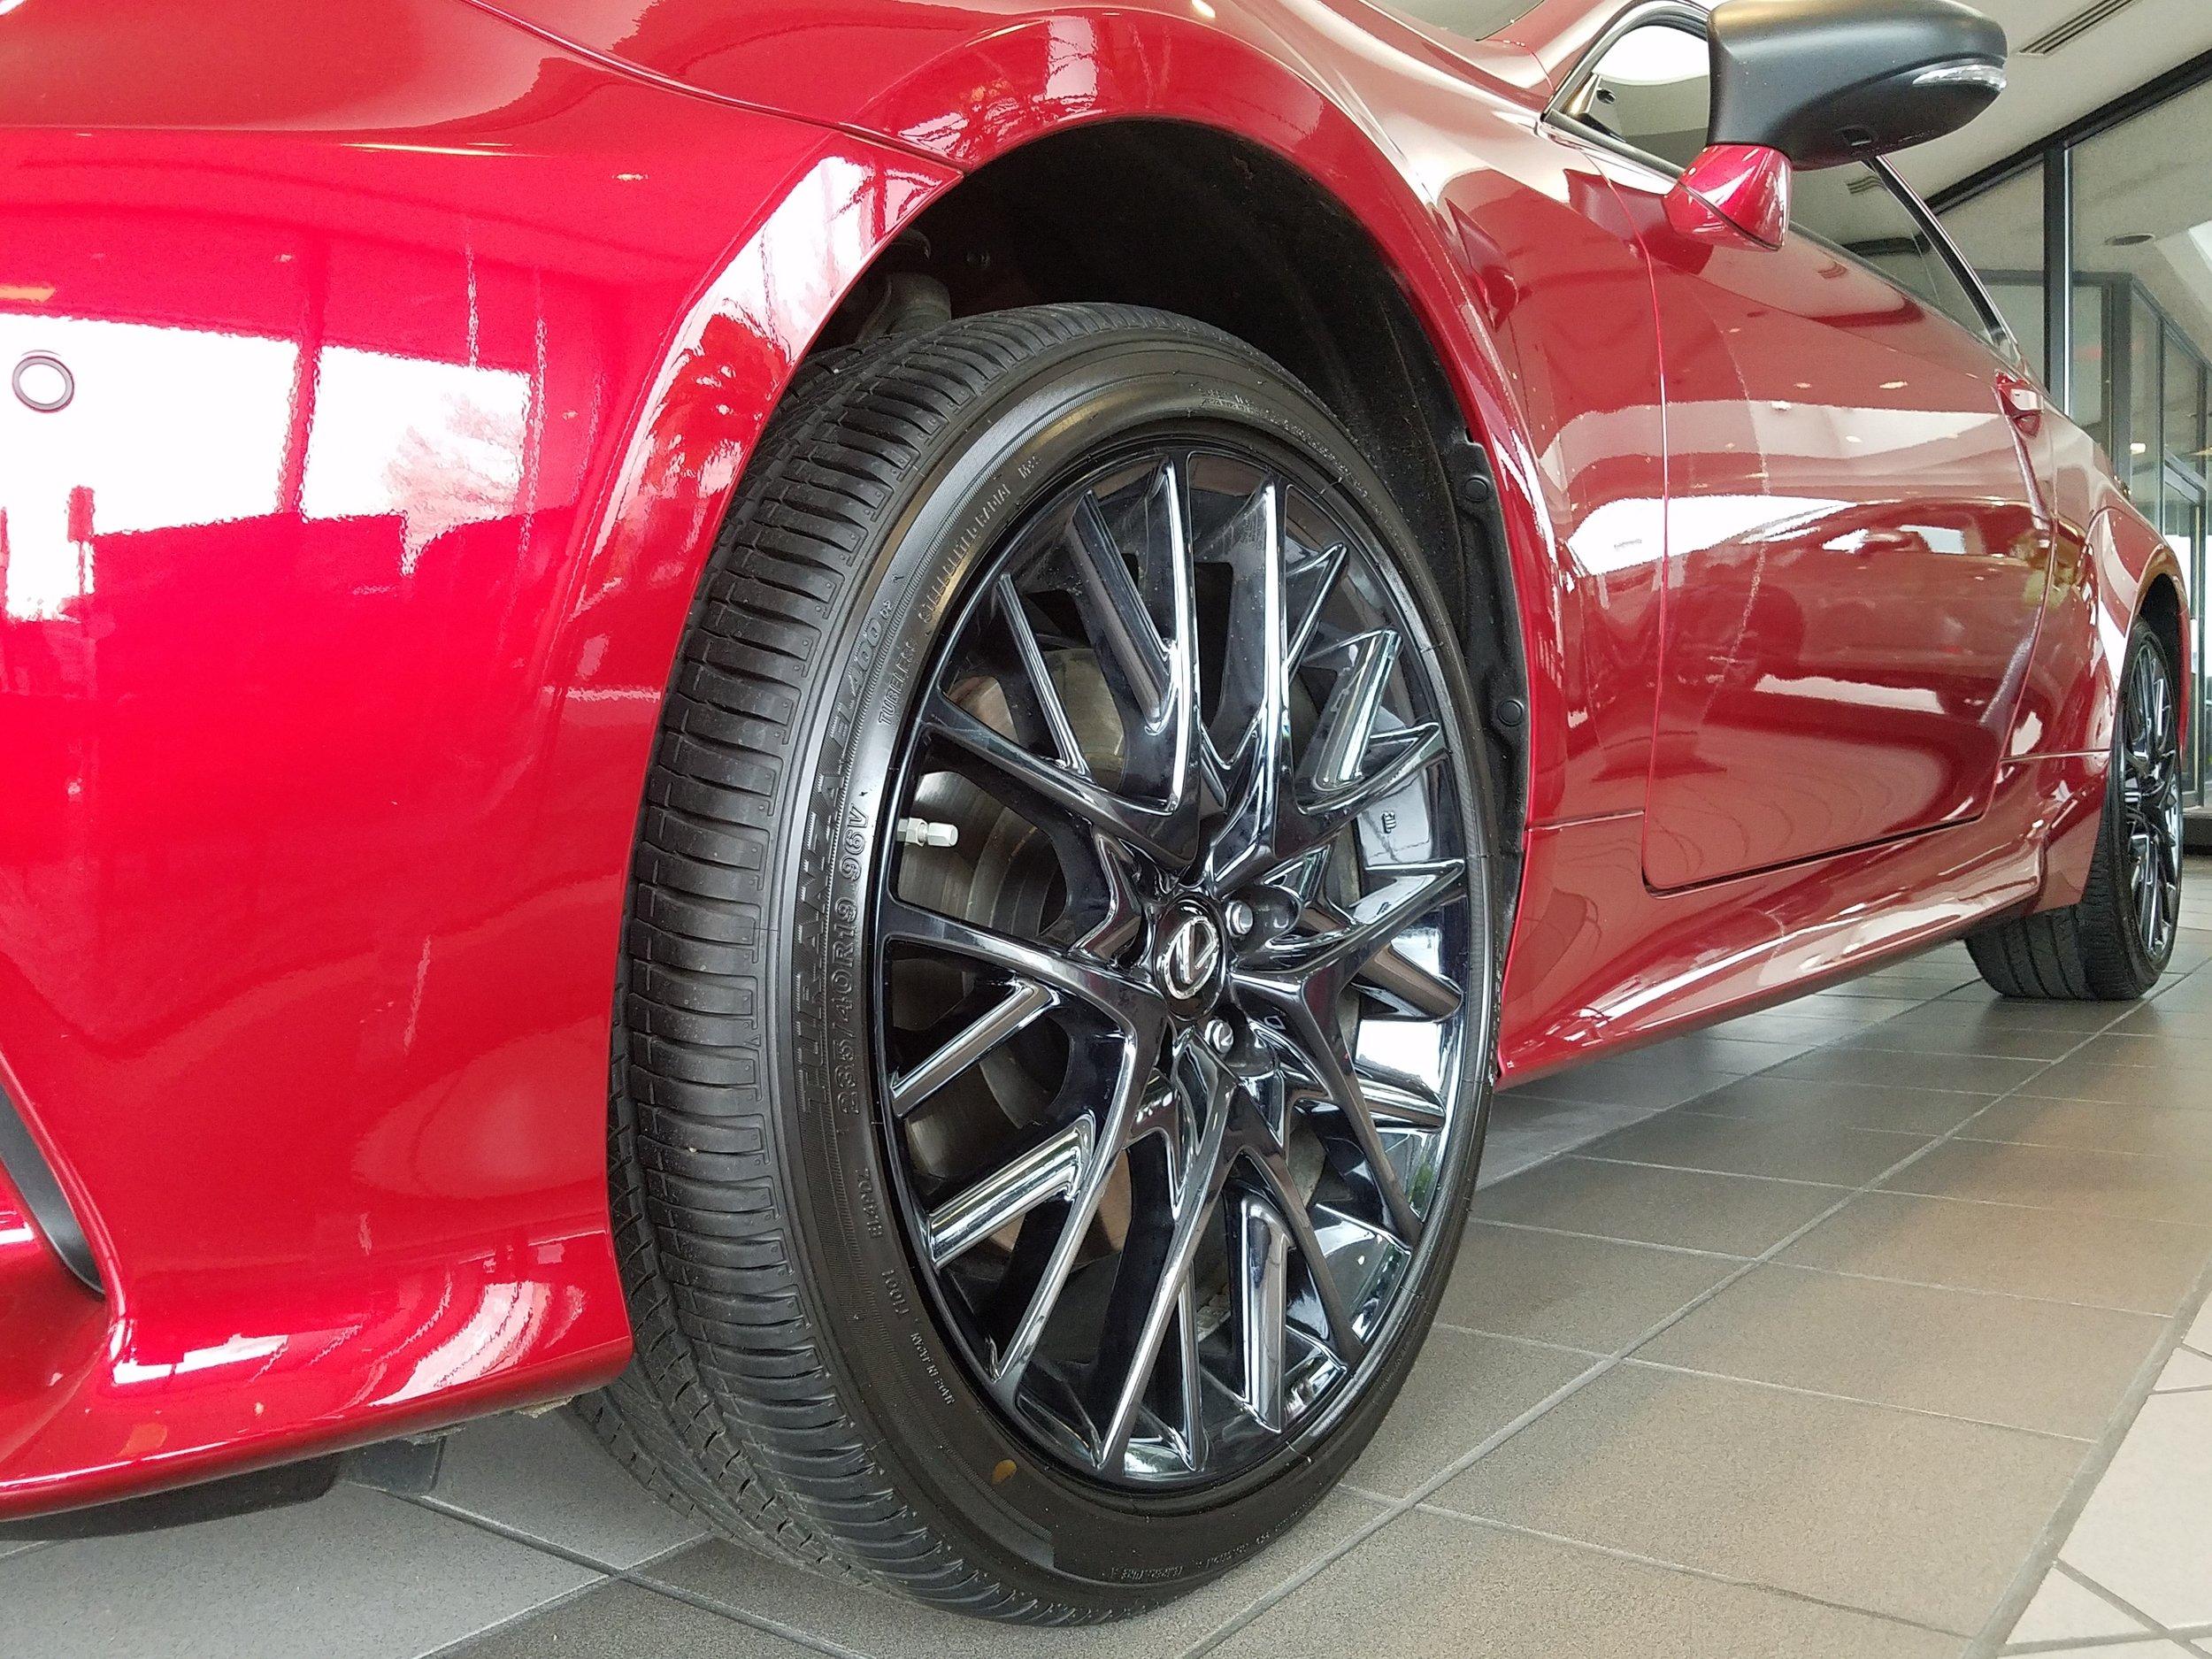 red-rc-black-ice-wheel-pic2_30869602462_o.jpg